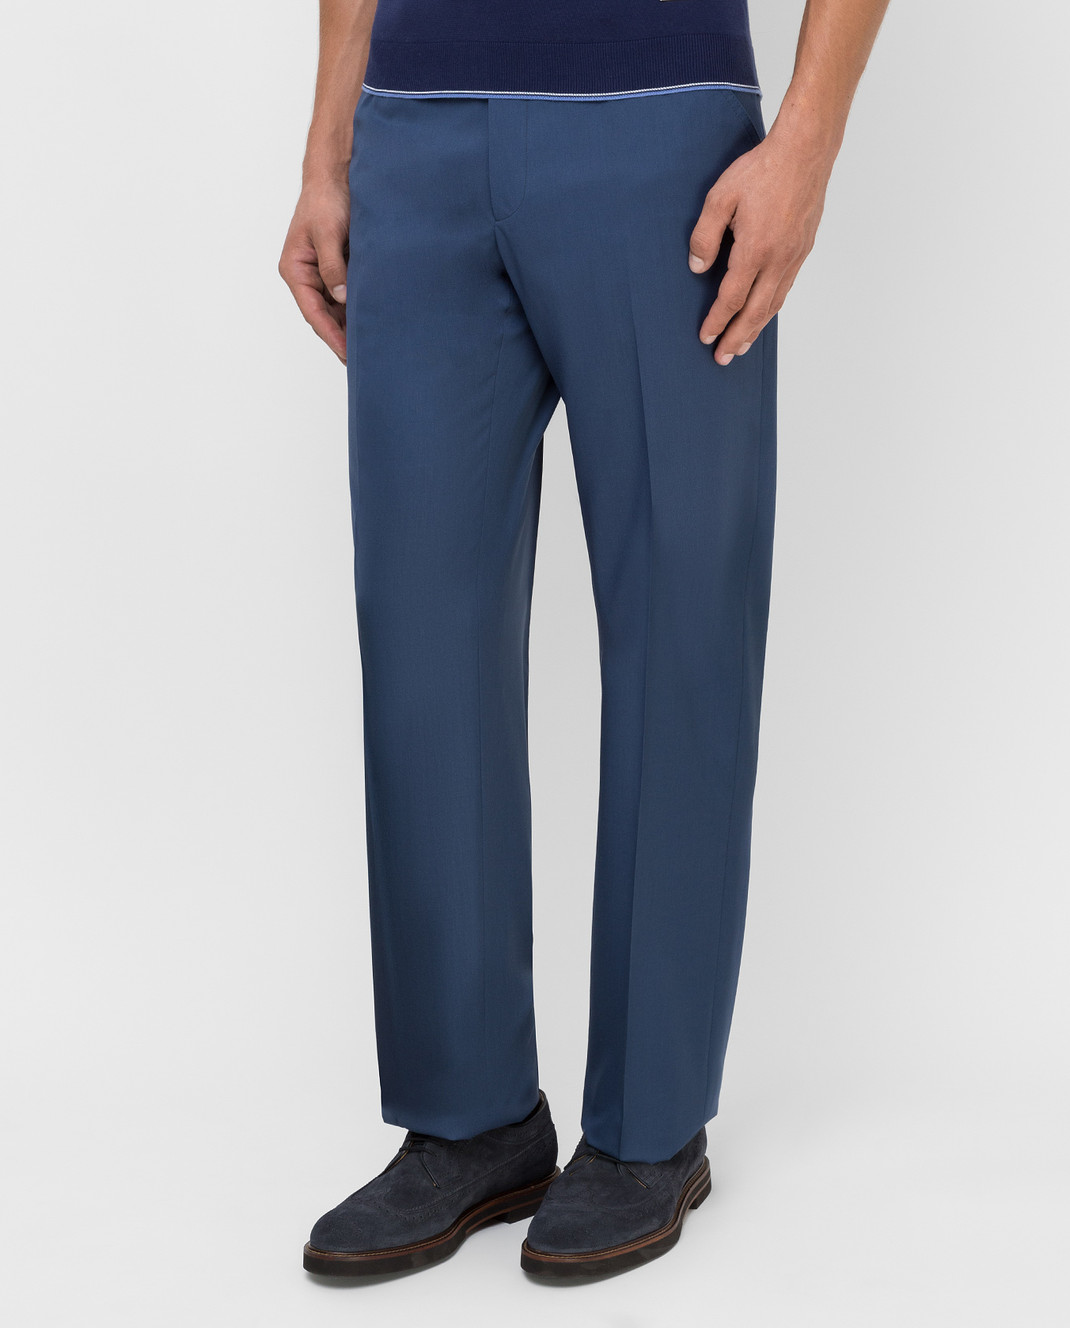 Castello d'Oro Синие брюки изображение 3